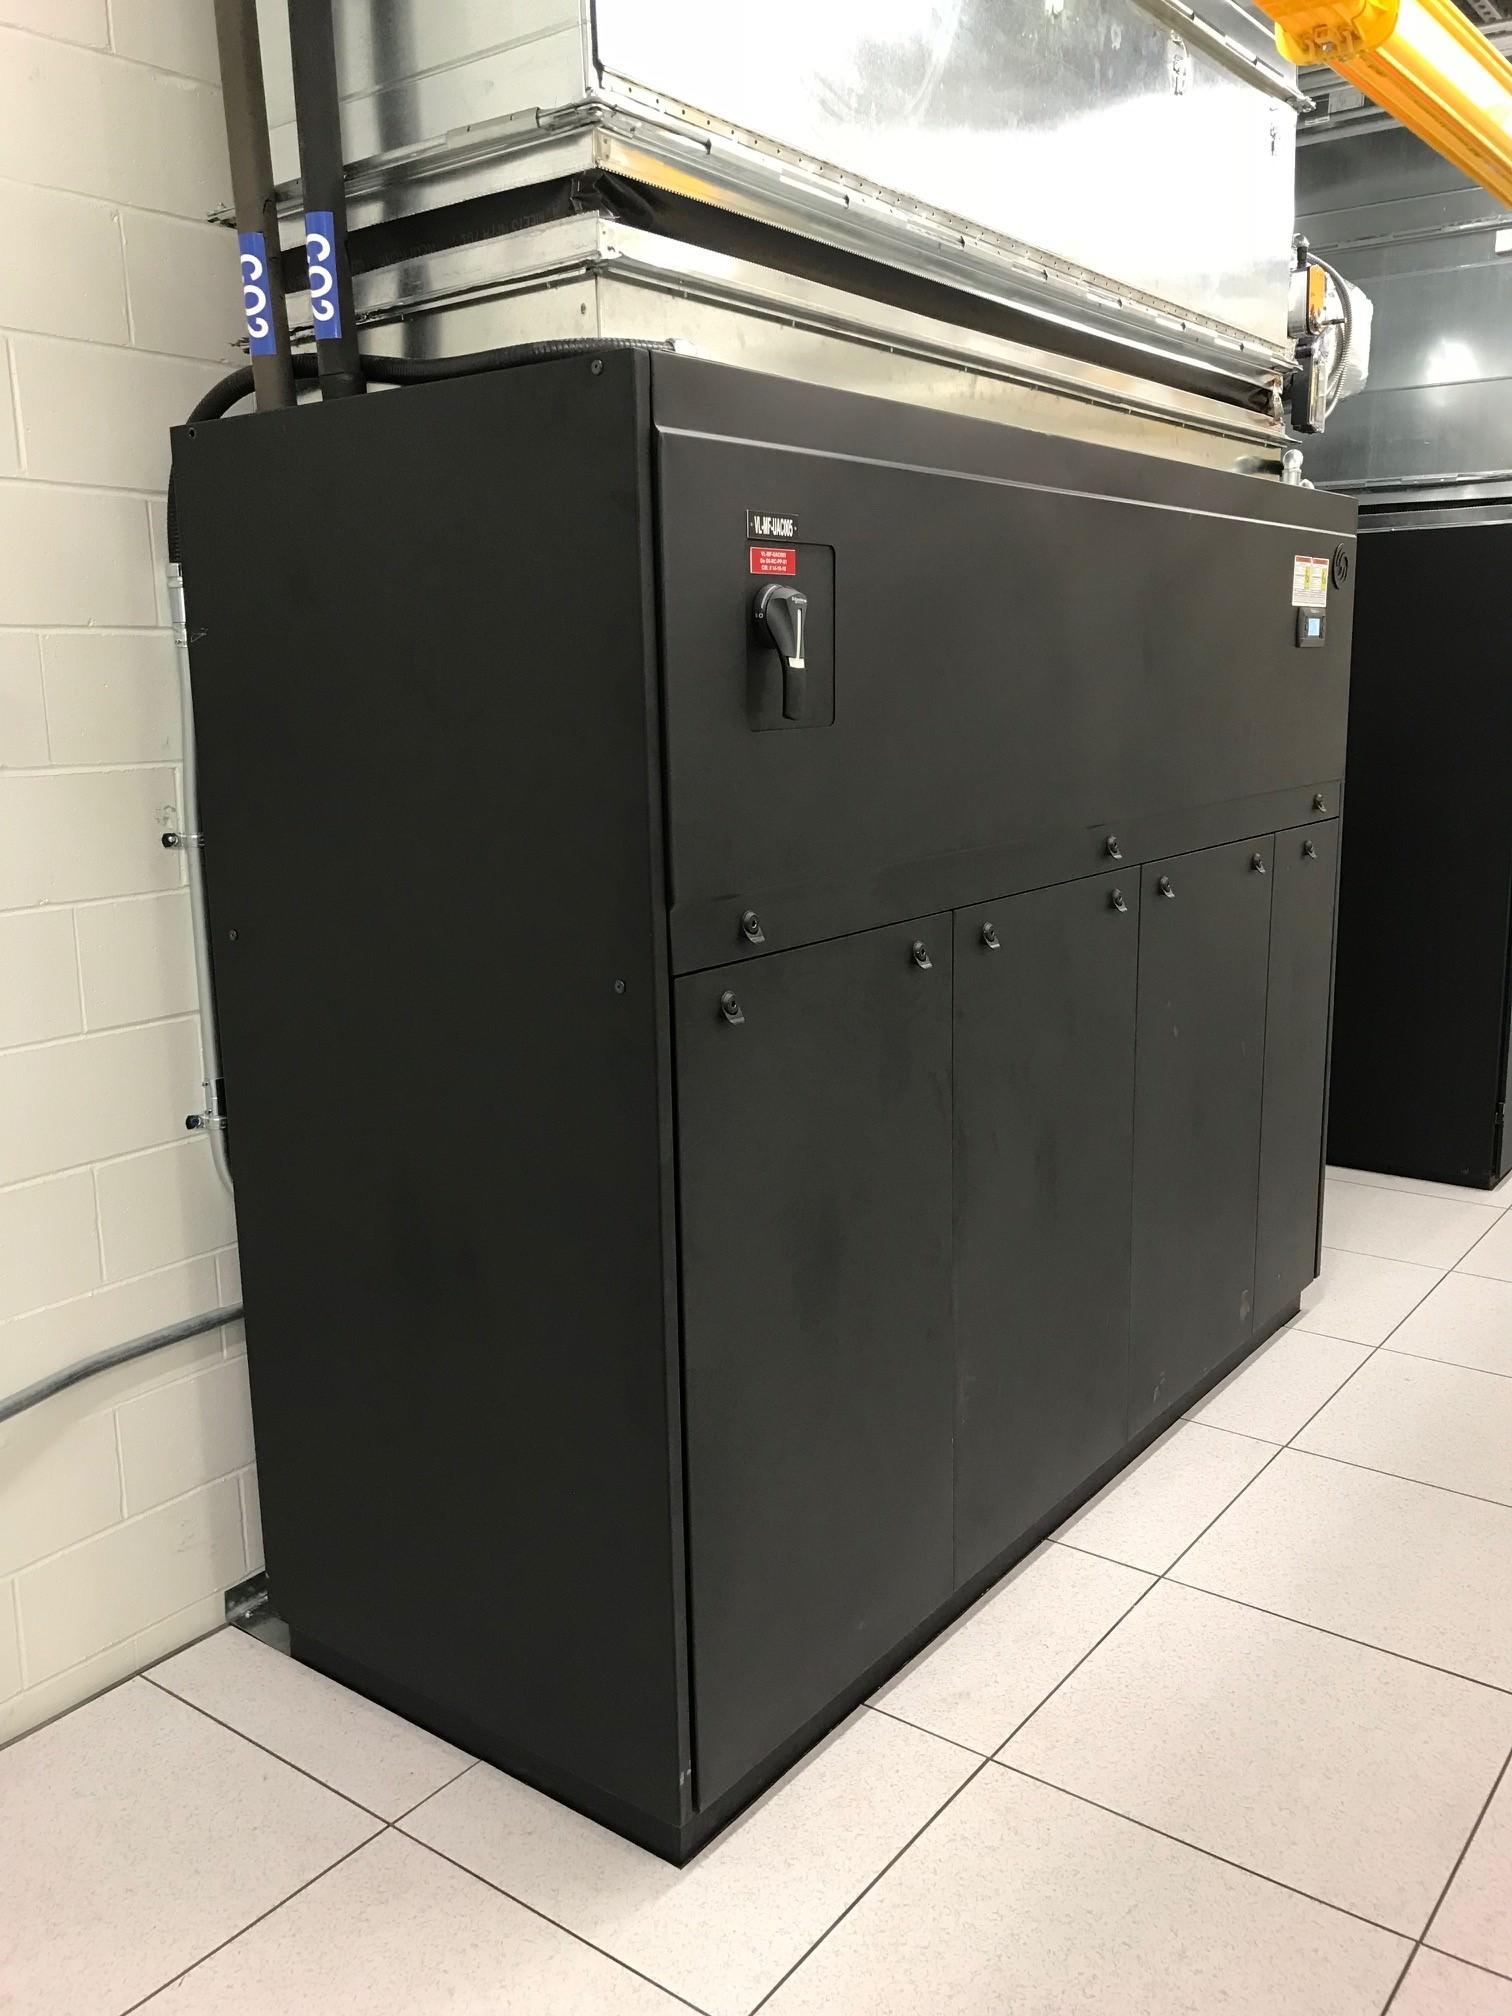 Gallery Aquilon CO2 CRAC Unit 3